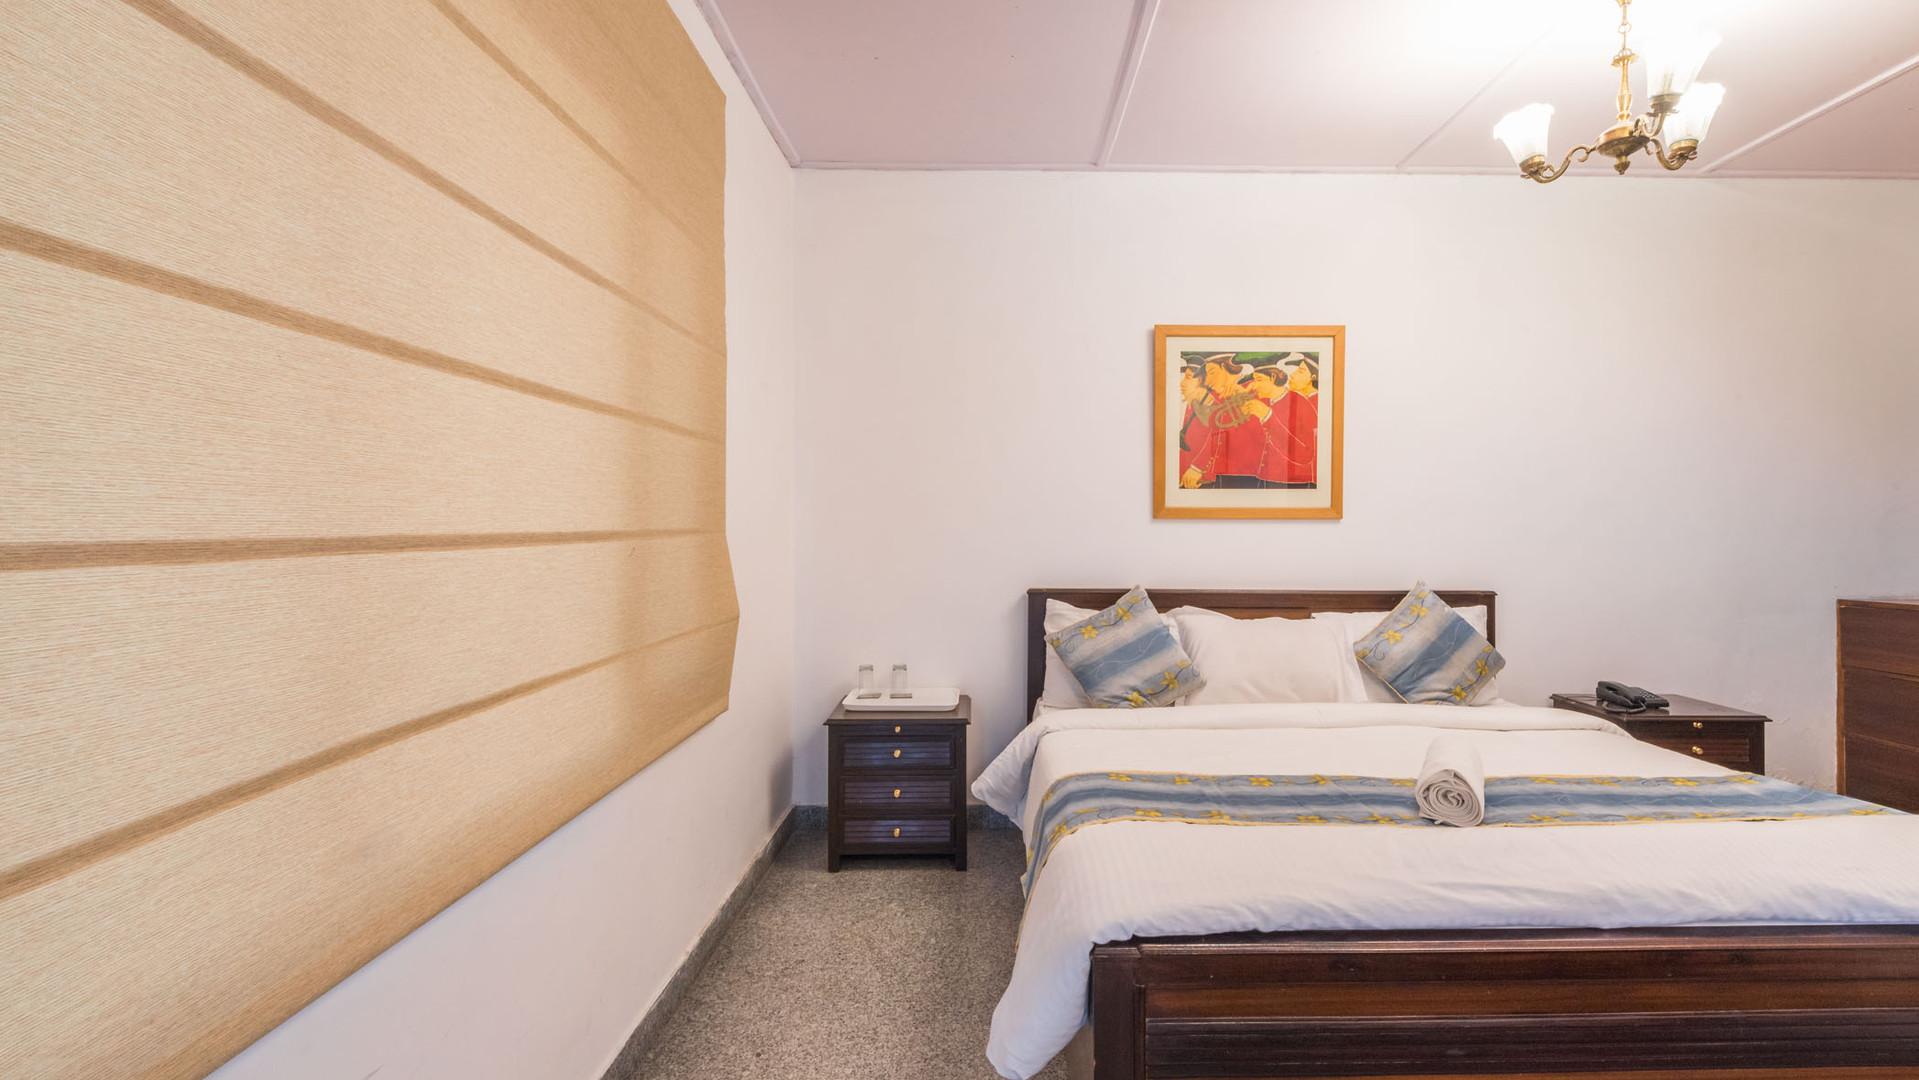 Standard_Rooms_Unbound_Albert_2.jpg